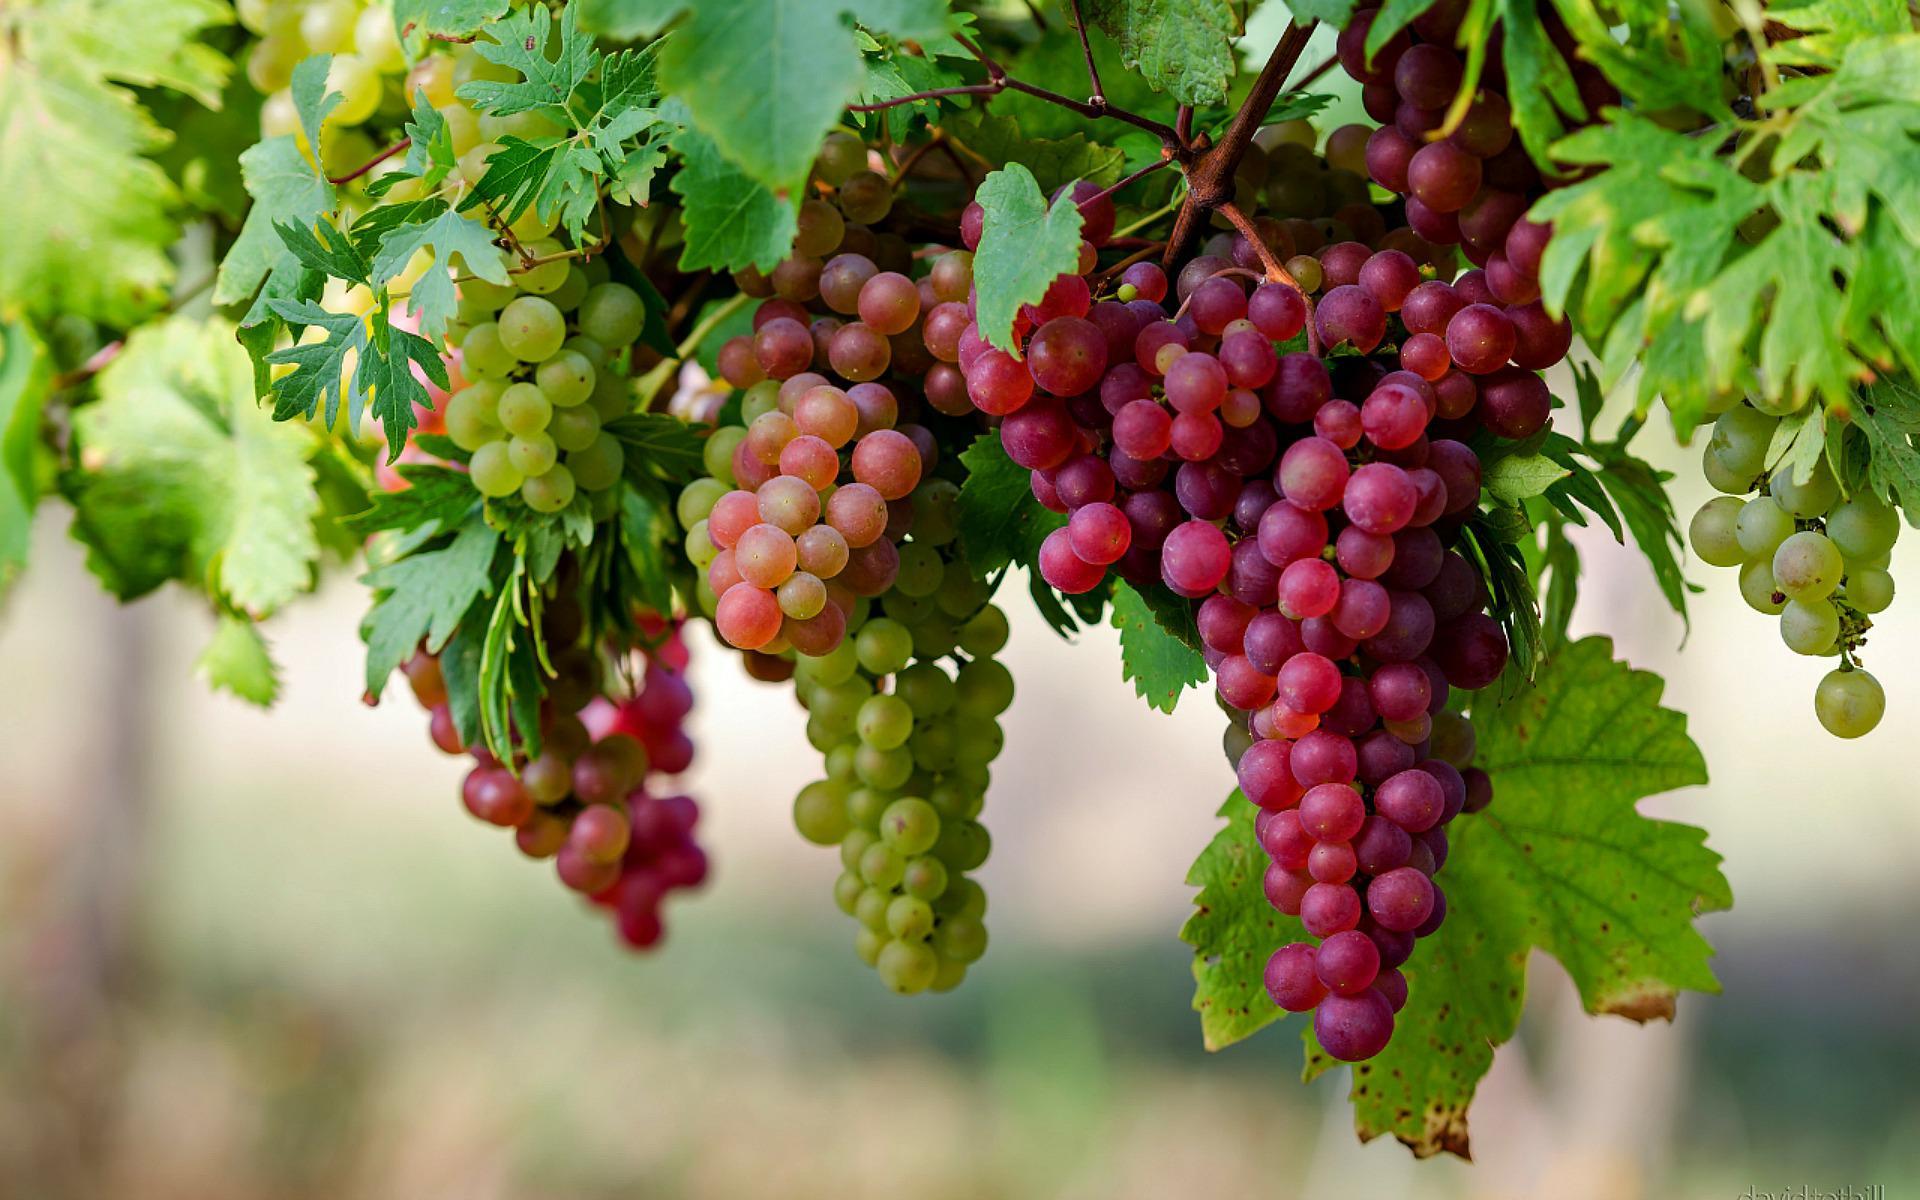 nature-beautiful-grapes-high-definition-full-screen-wallpaper-image-download.jpg